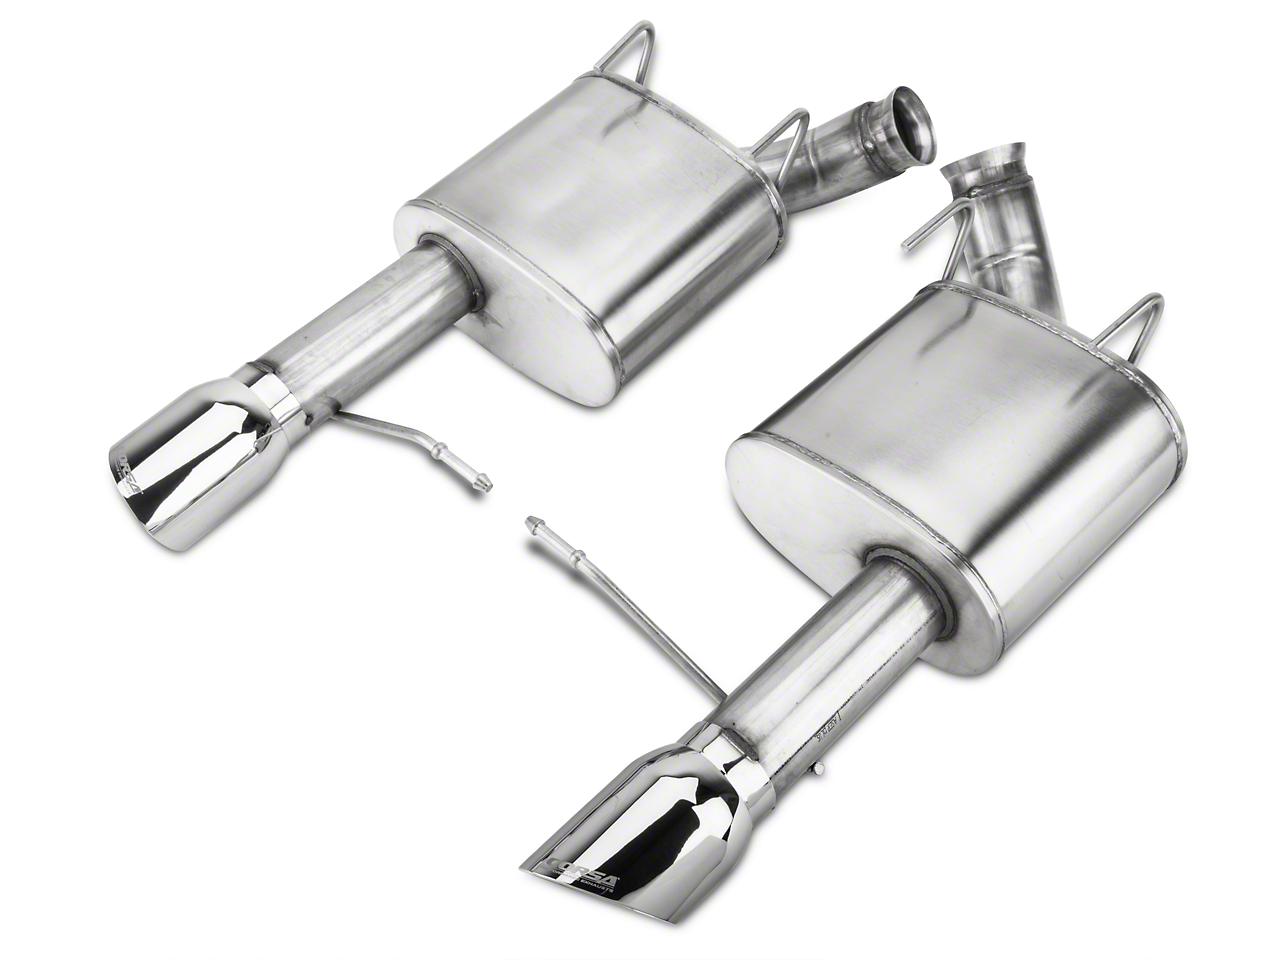 Corsa Xtreme Axleback Exhaust (11-14 GT, BOSS)